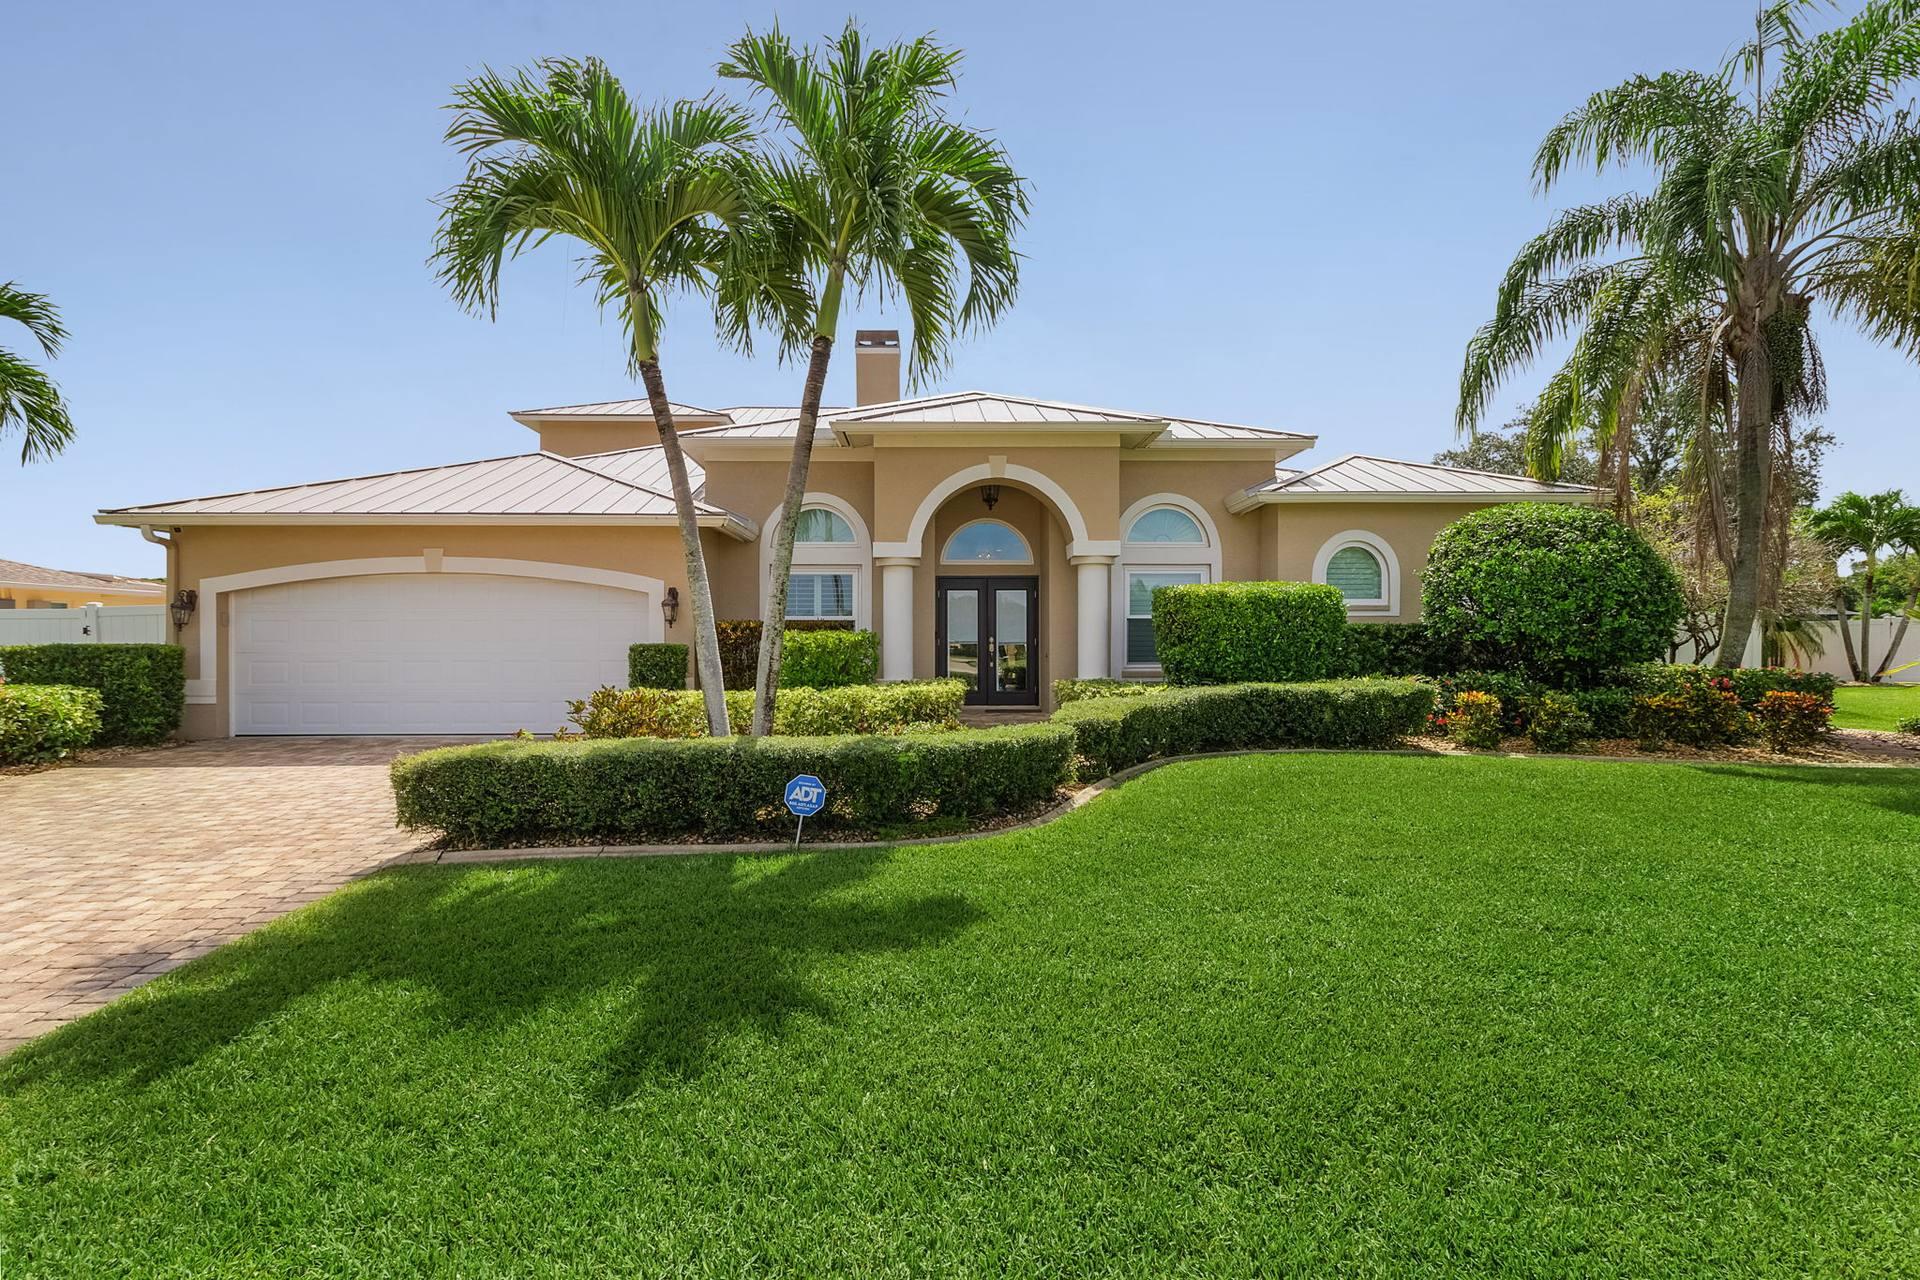 5430 Brandy Cir, Fort Myers, FL 33919, USA